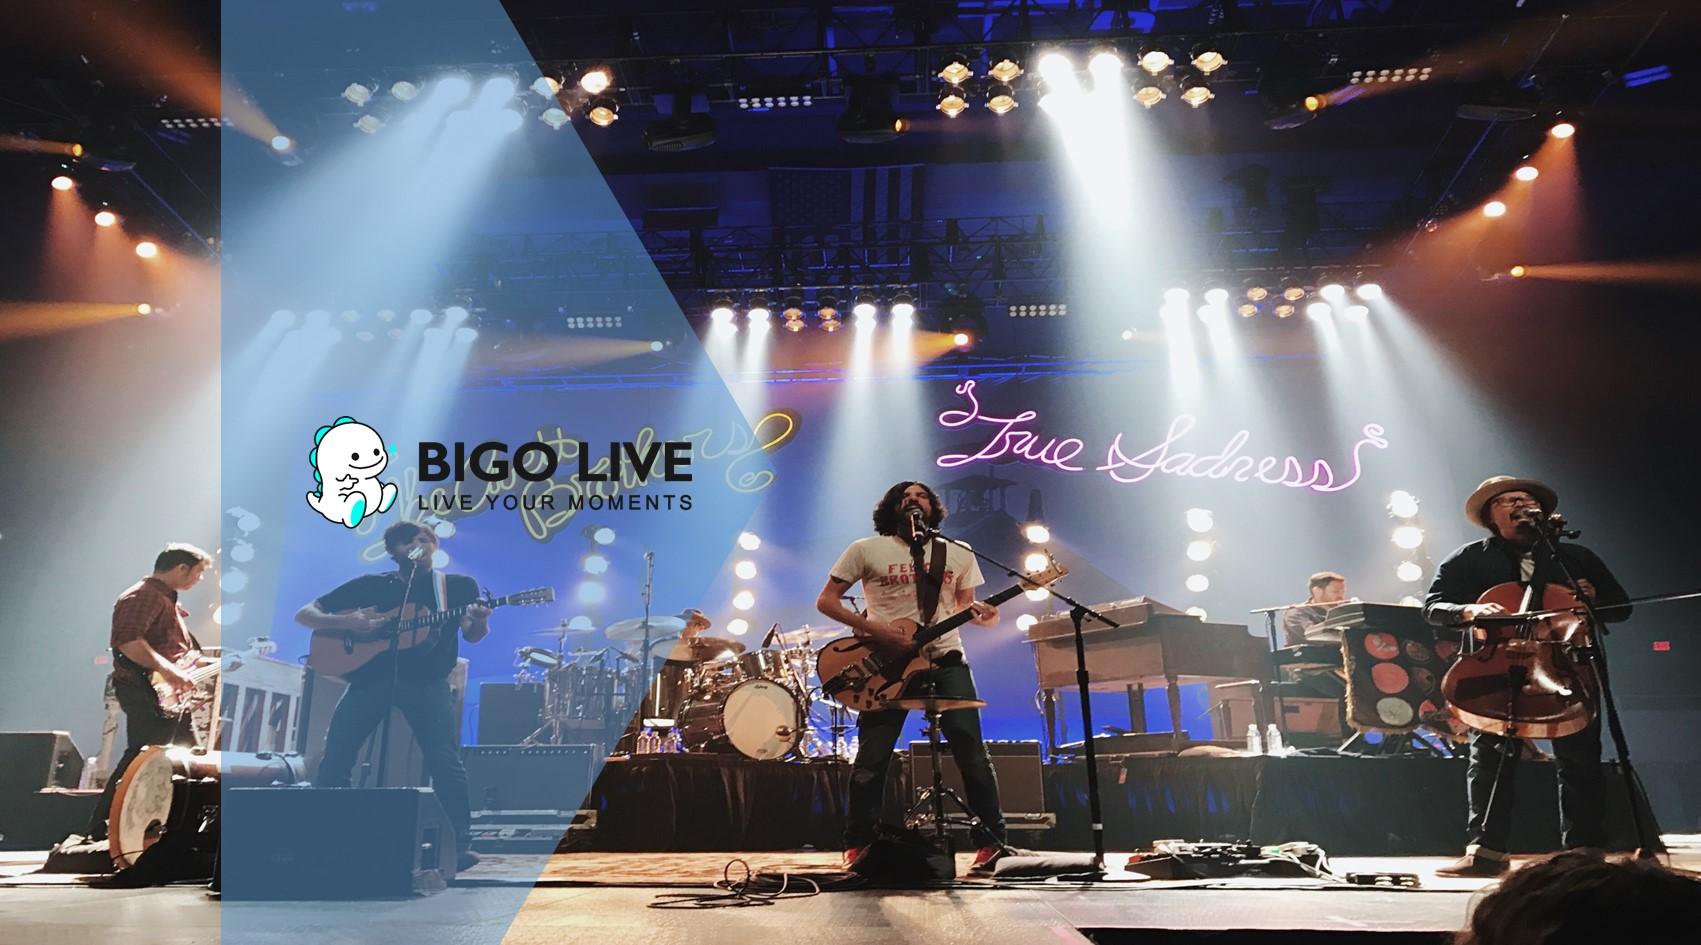 Live Stream Video App